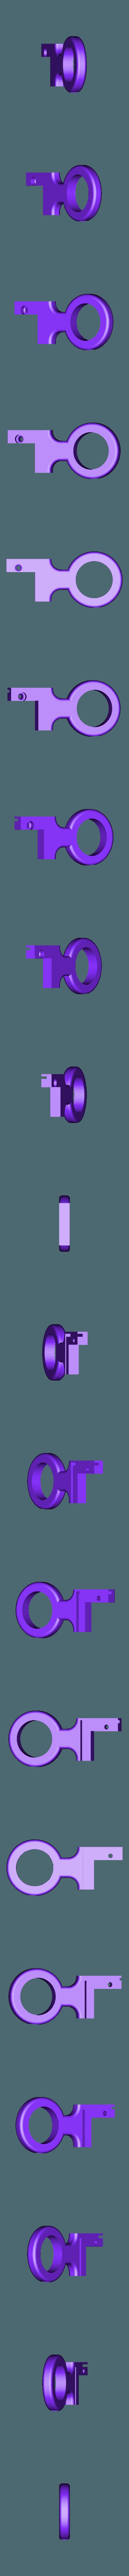 tringle-gauche.stl Download free STL file Bar rod • Template to 3D print, david39